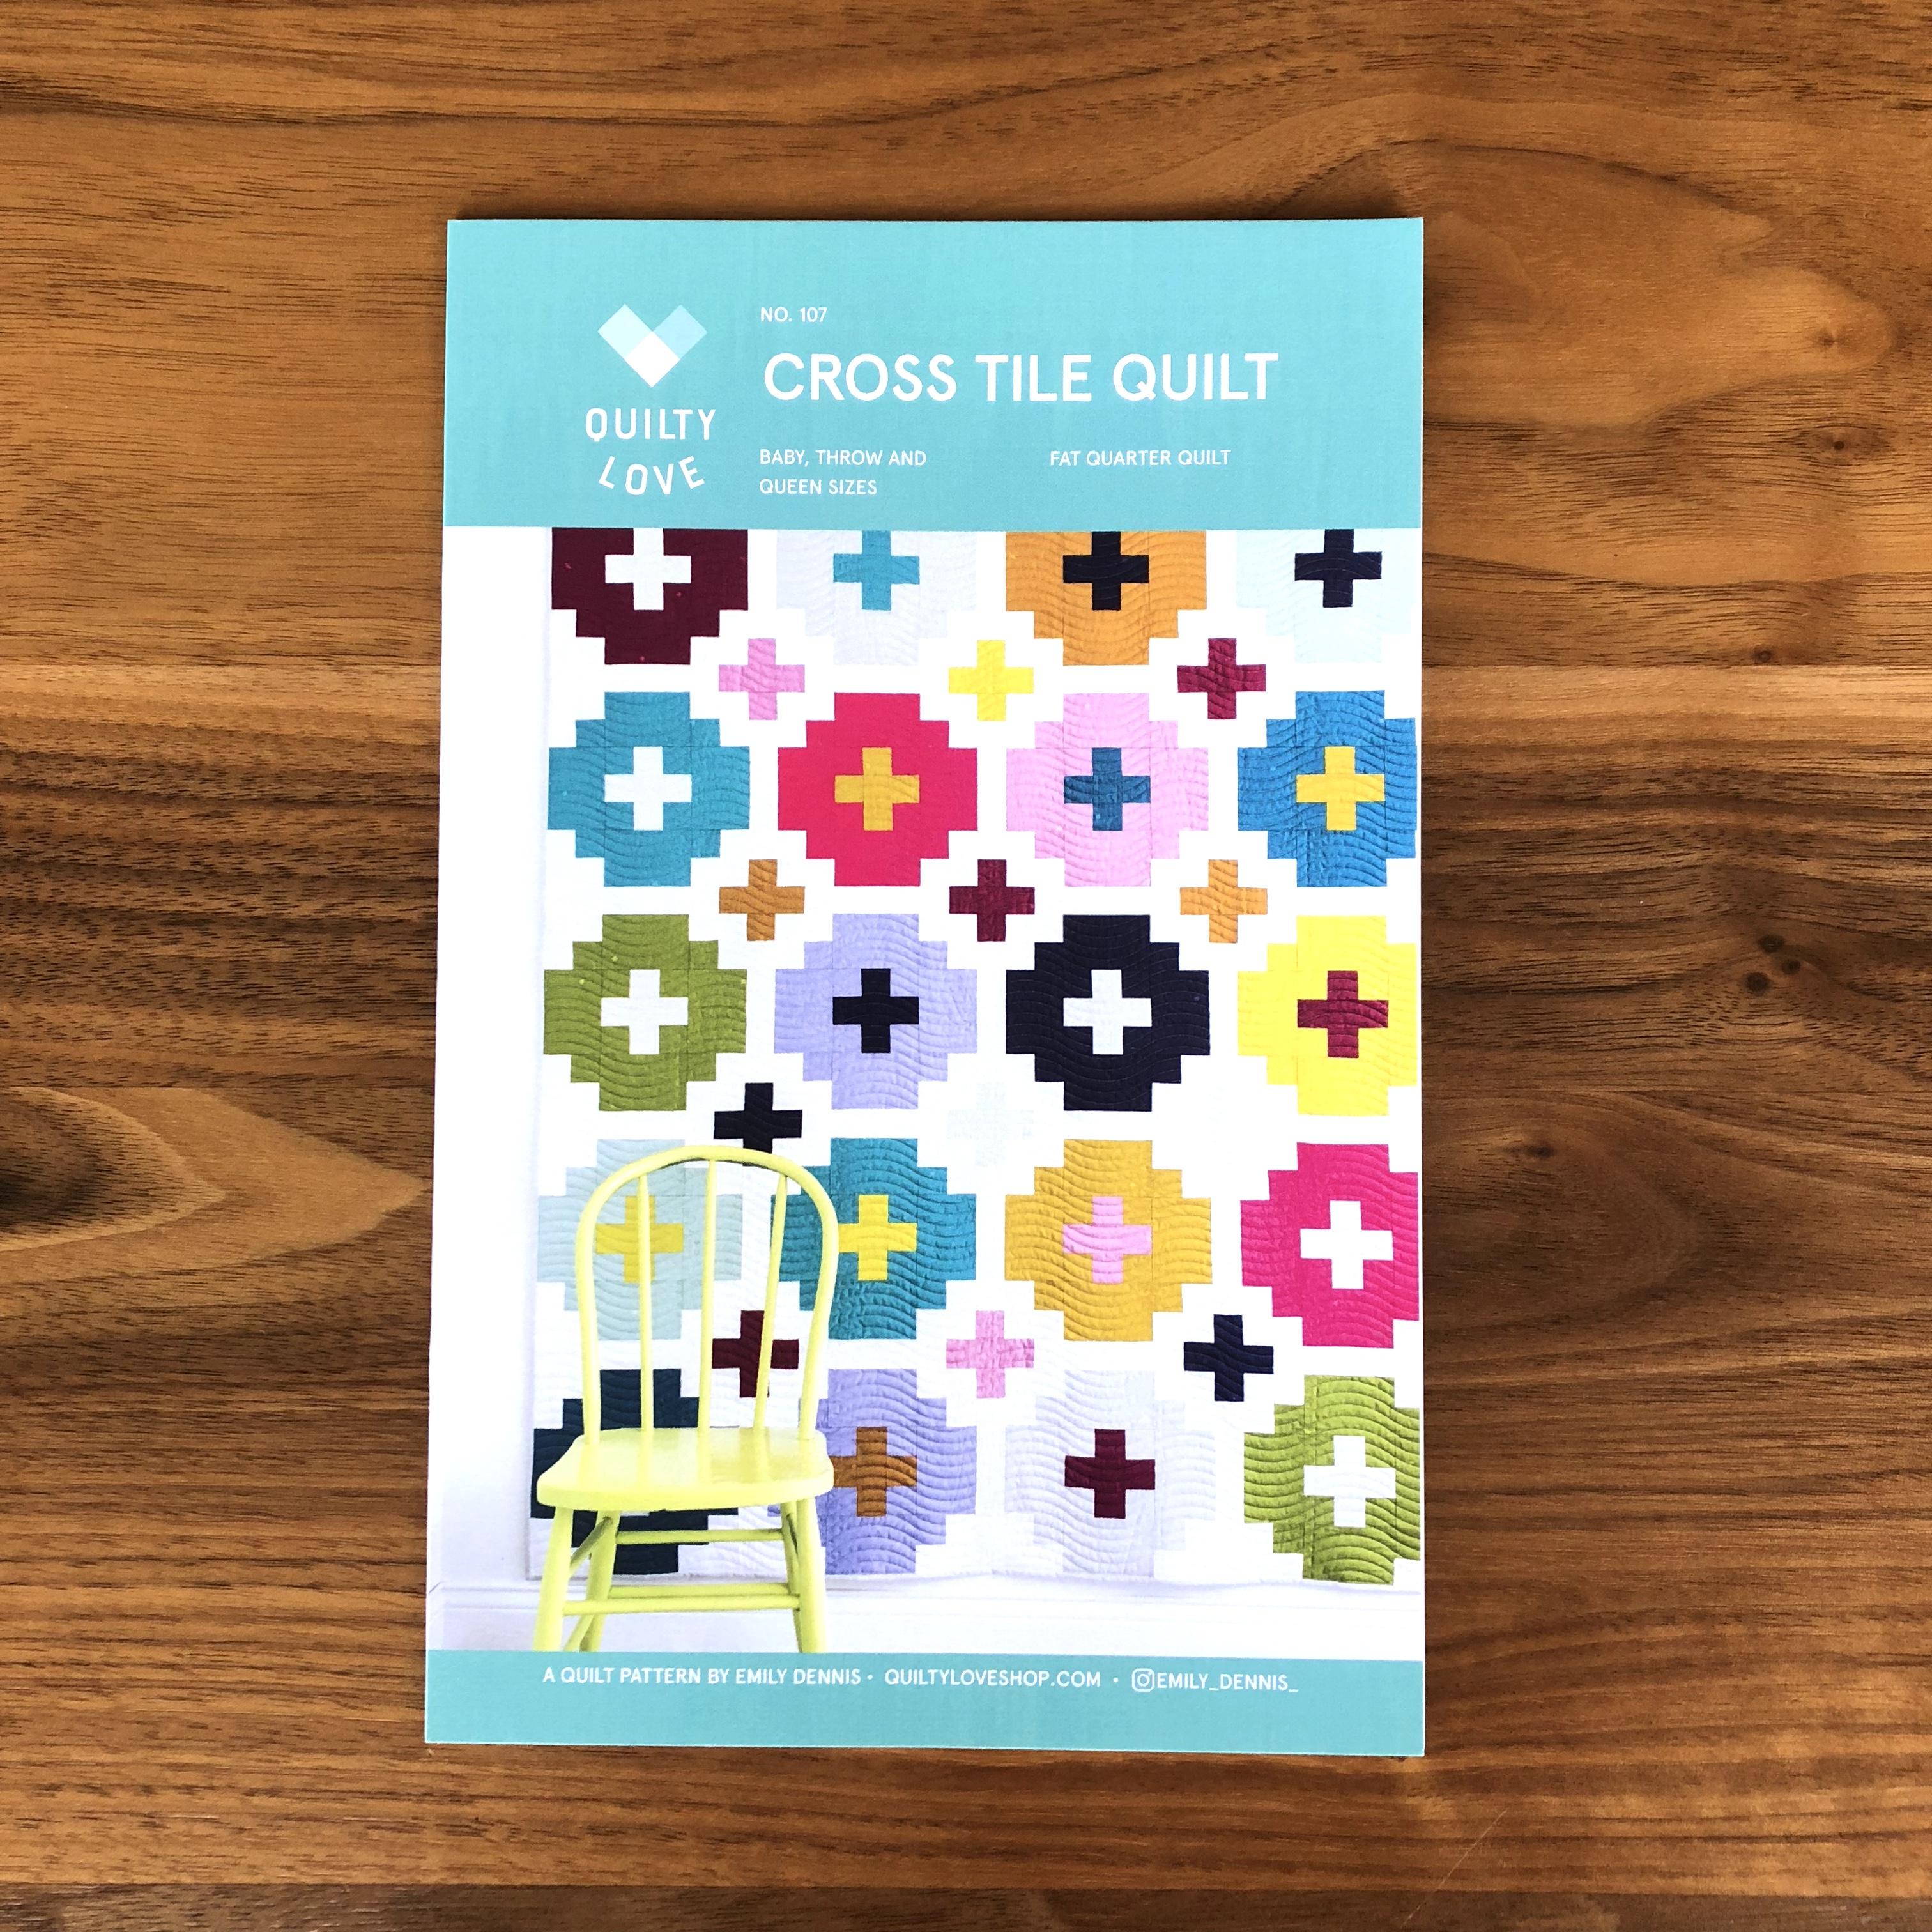 Cross Tile Quilt (Quilty Love)